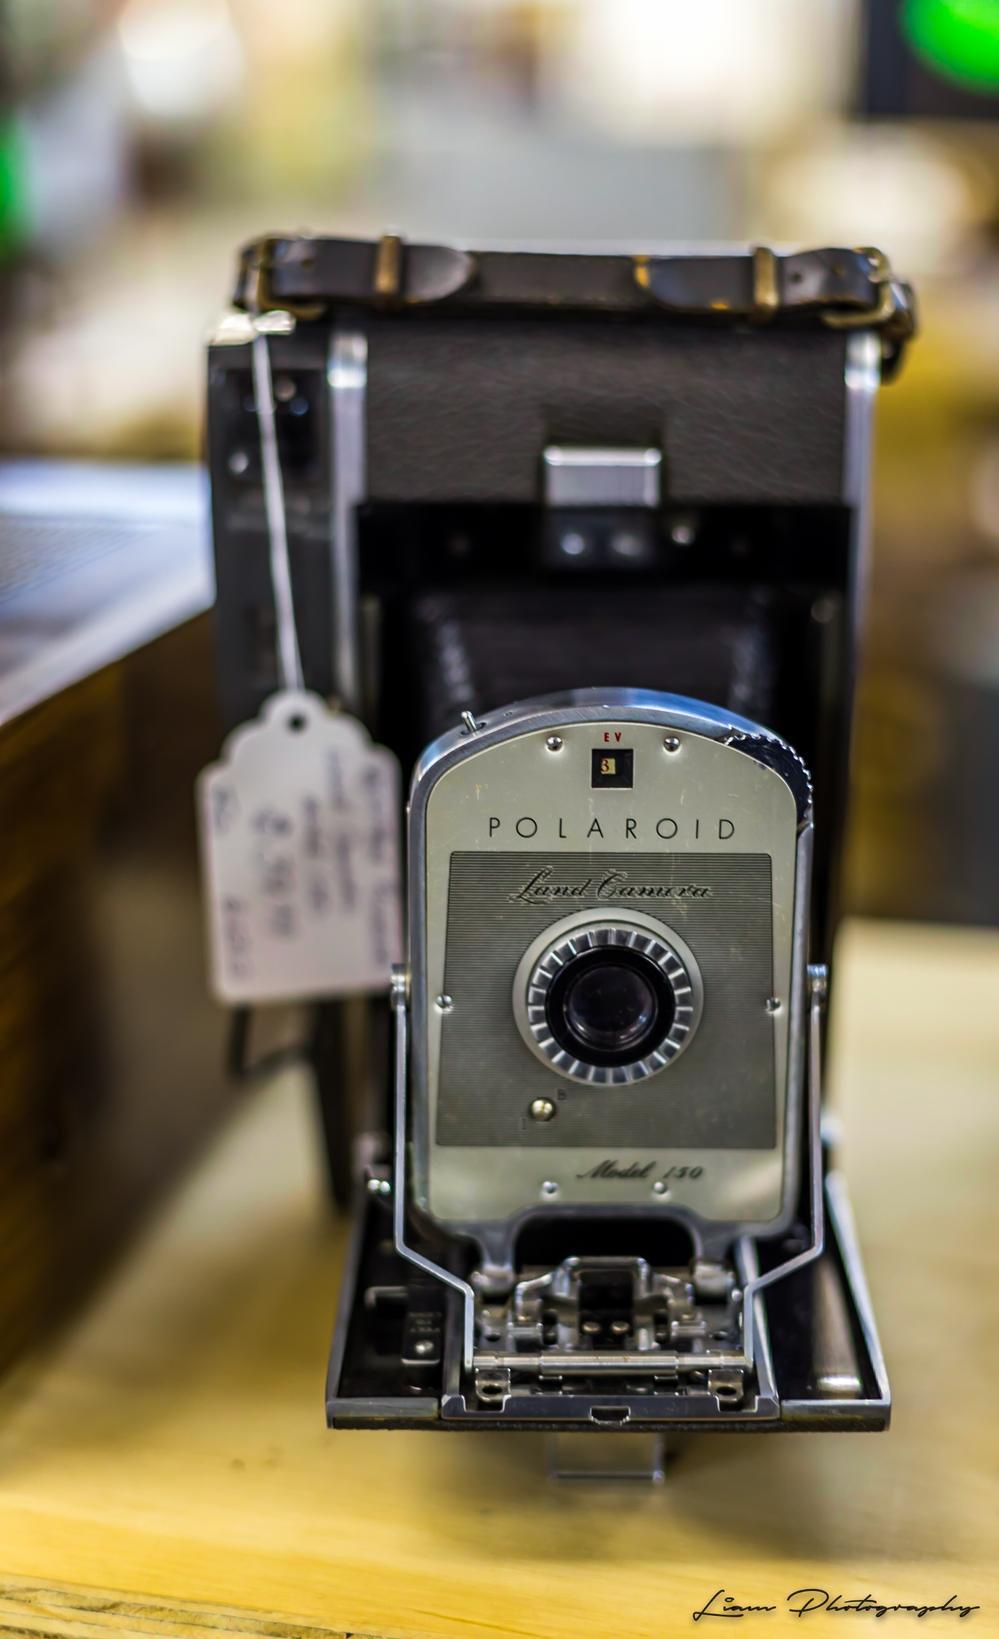 Old Polaroid Land Camera, Model 130 via Liam Douglas - Professional Photographer